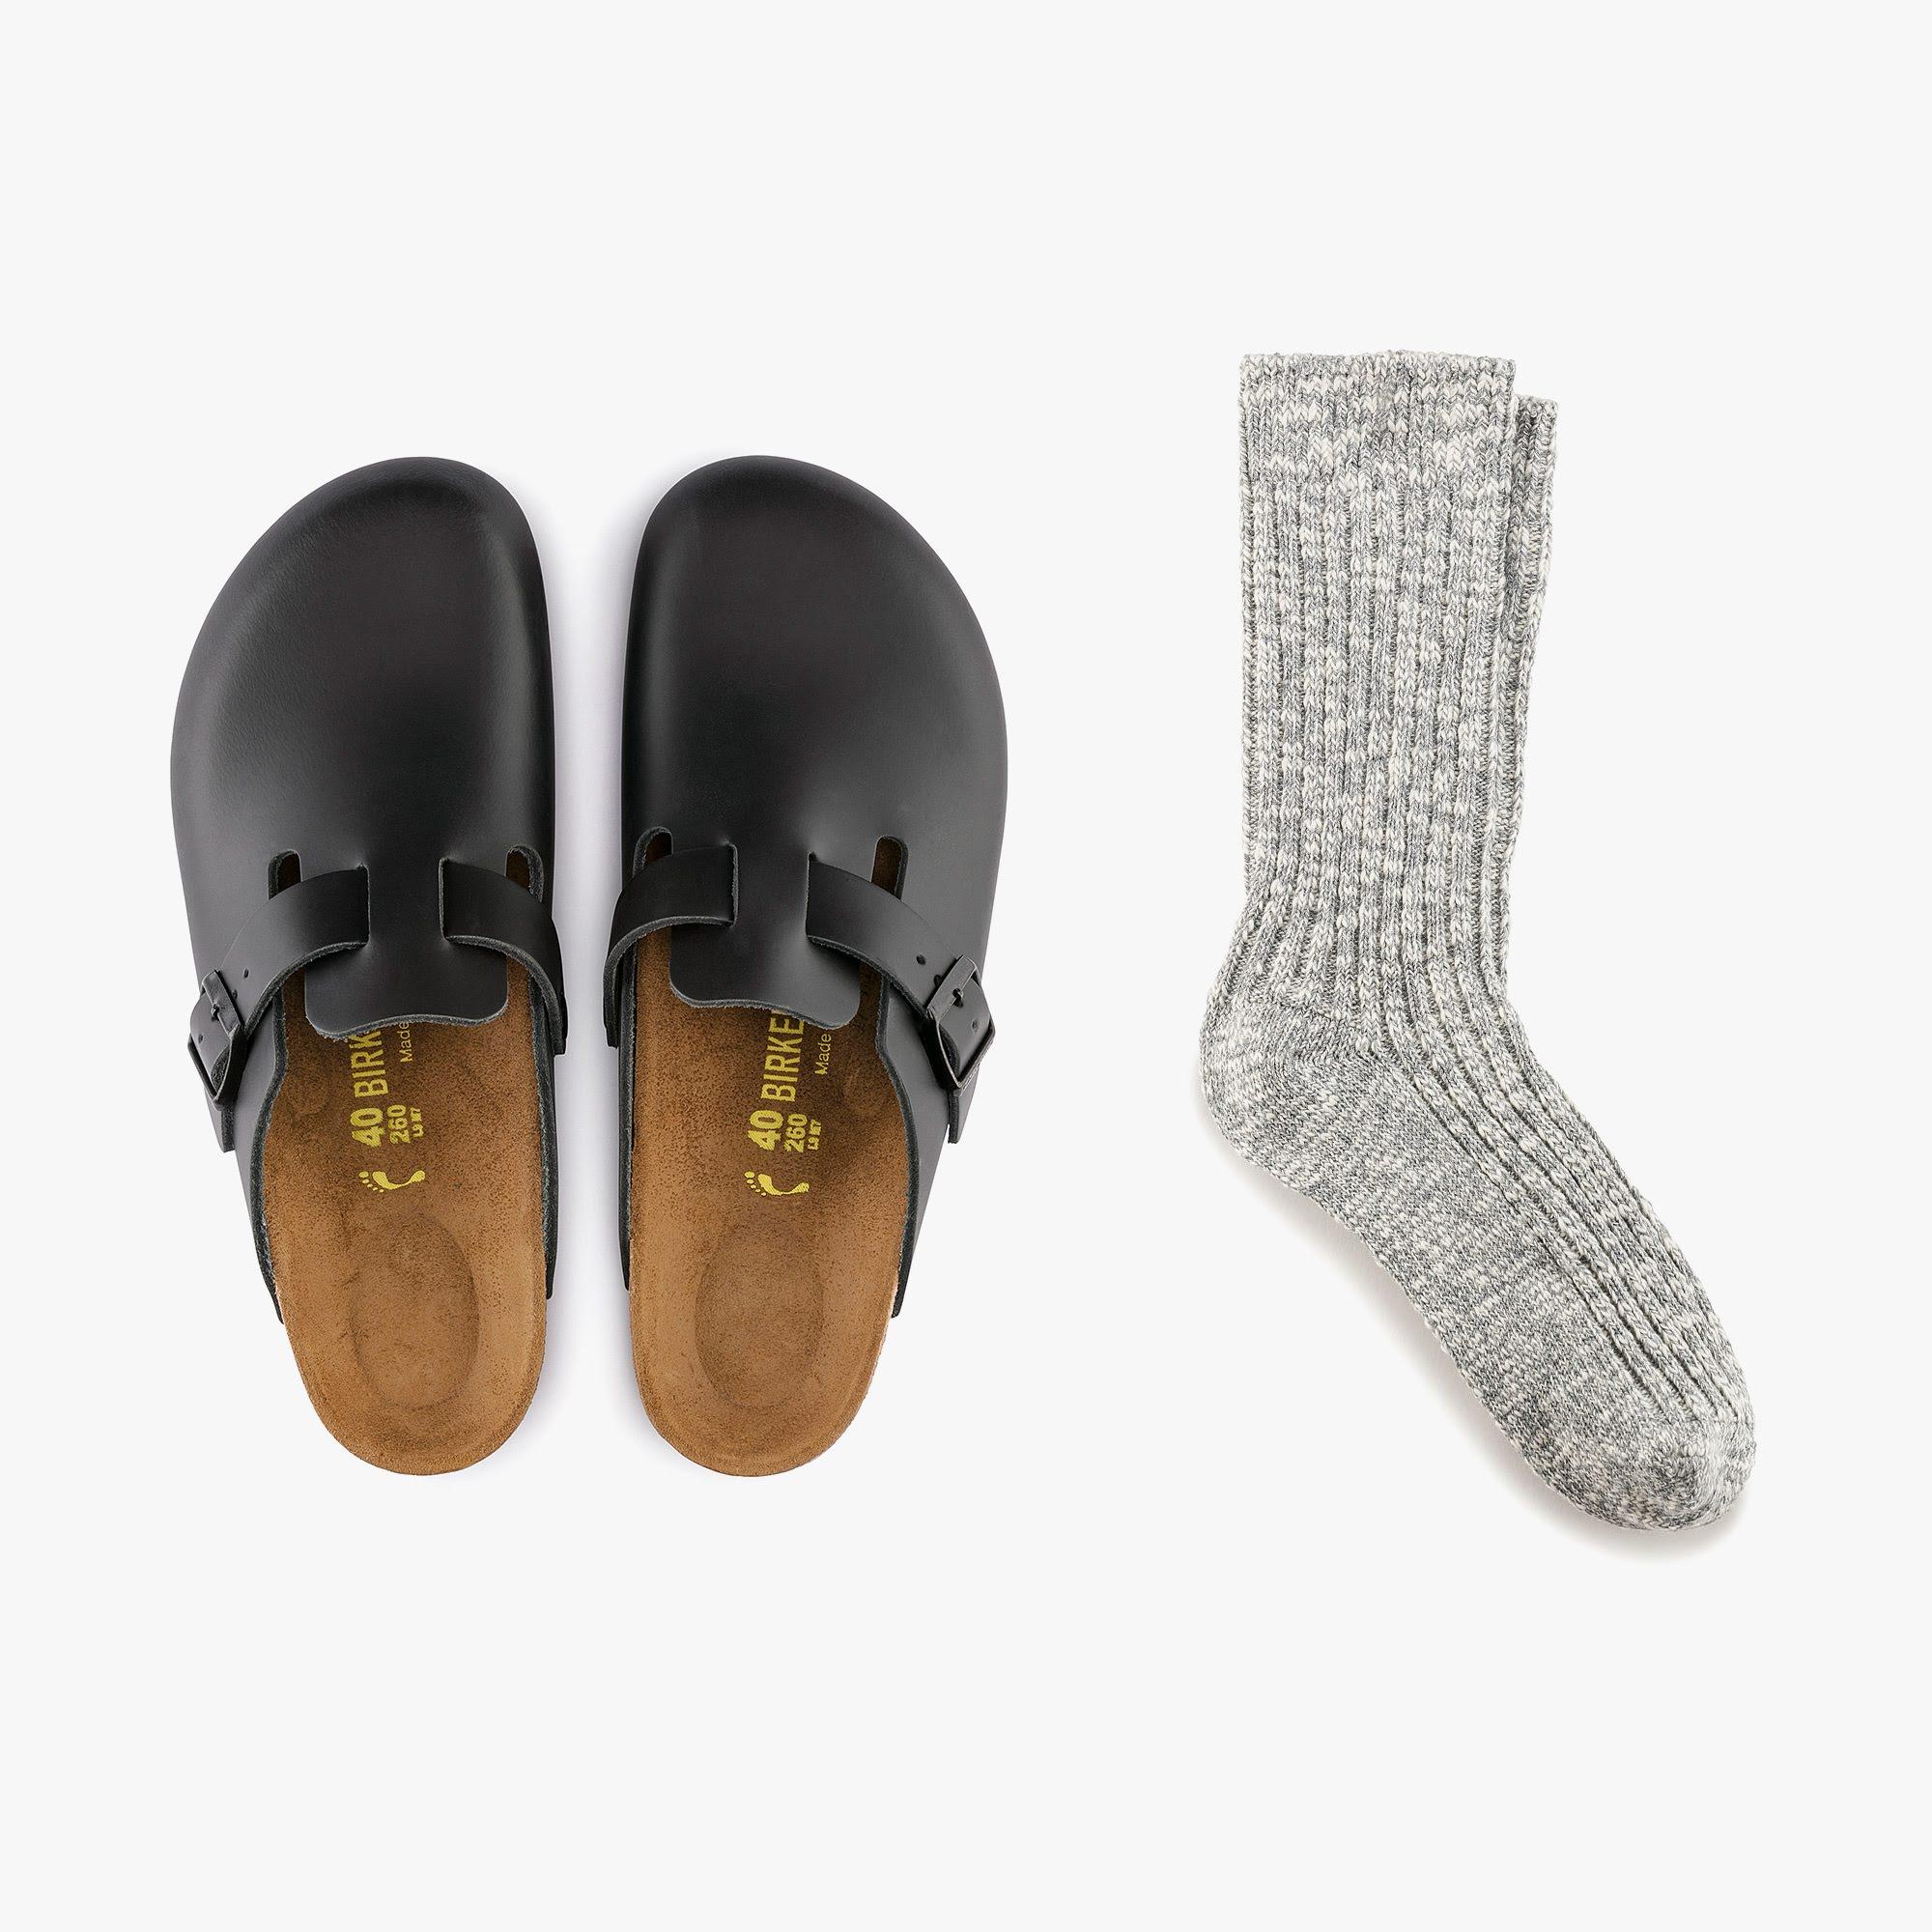 Birkenstock Schuhe: Top Qualität & Komfort   Forster